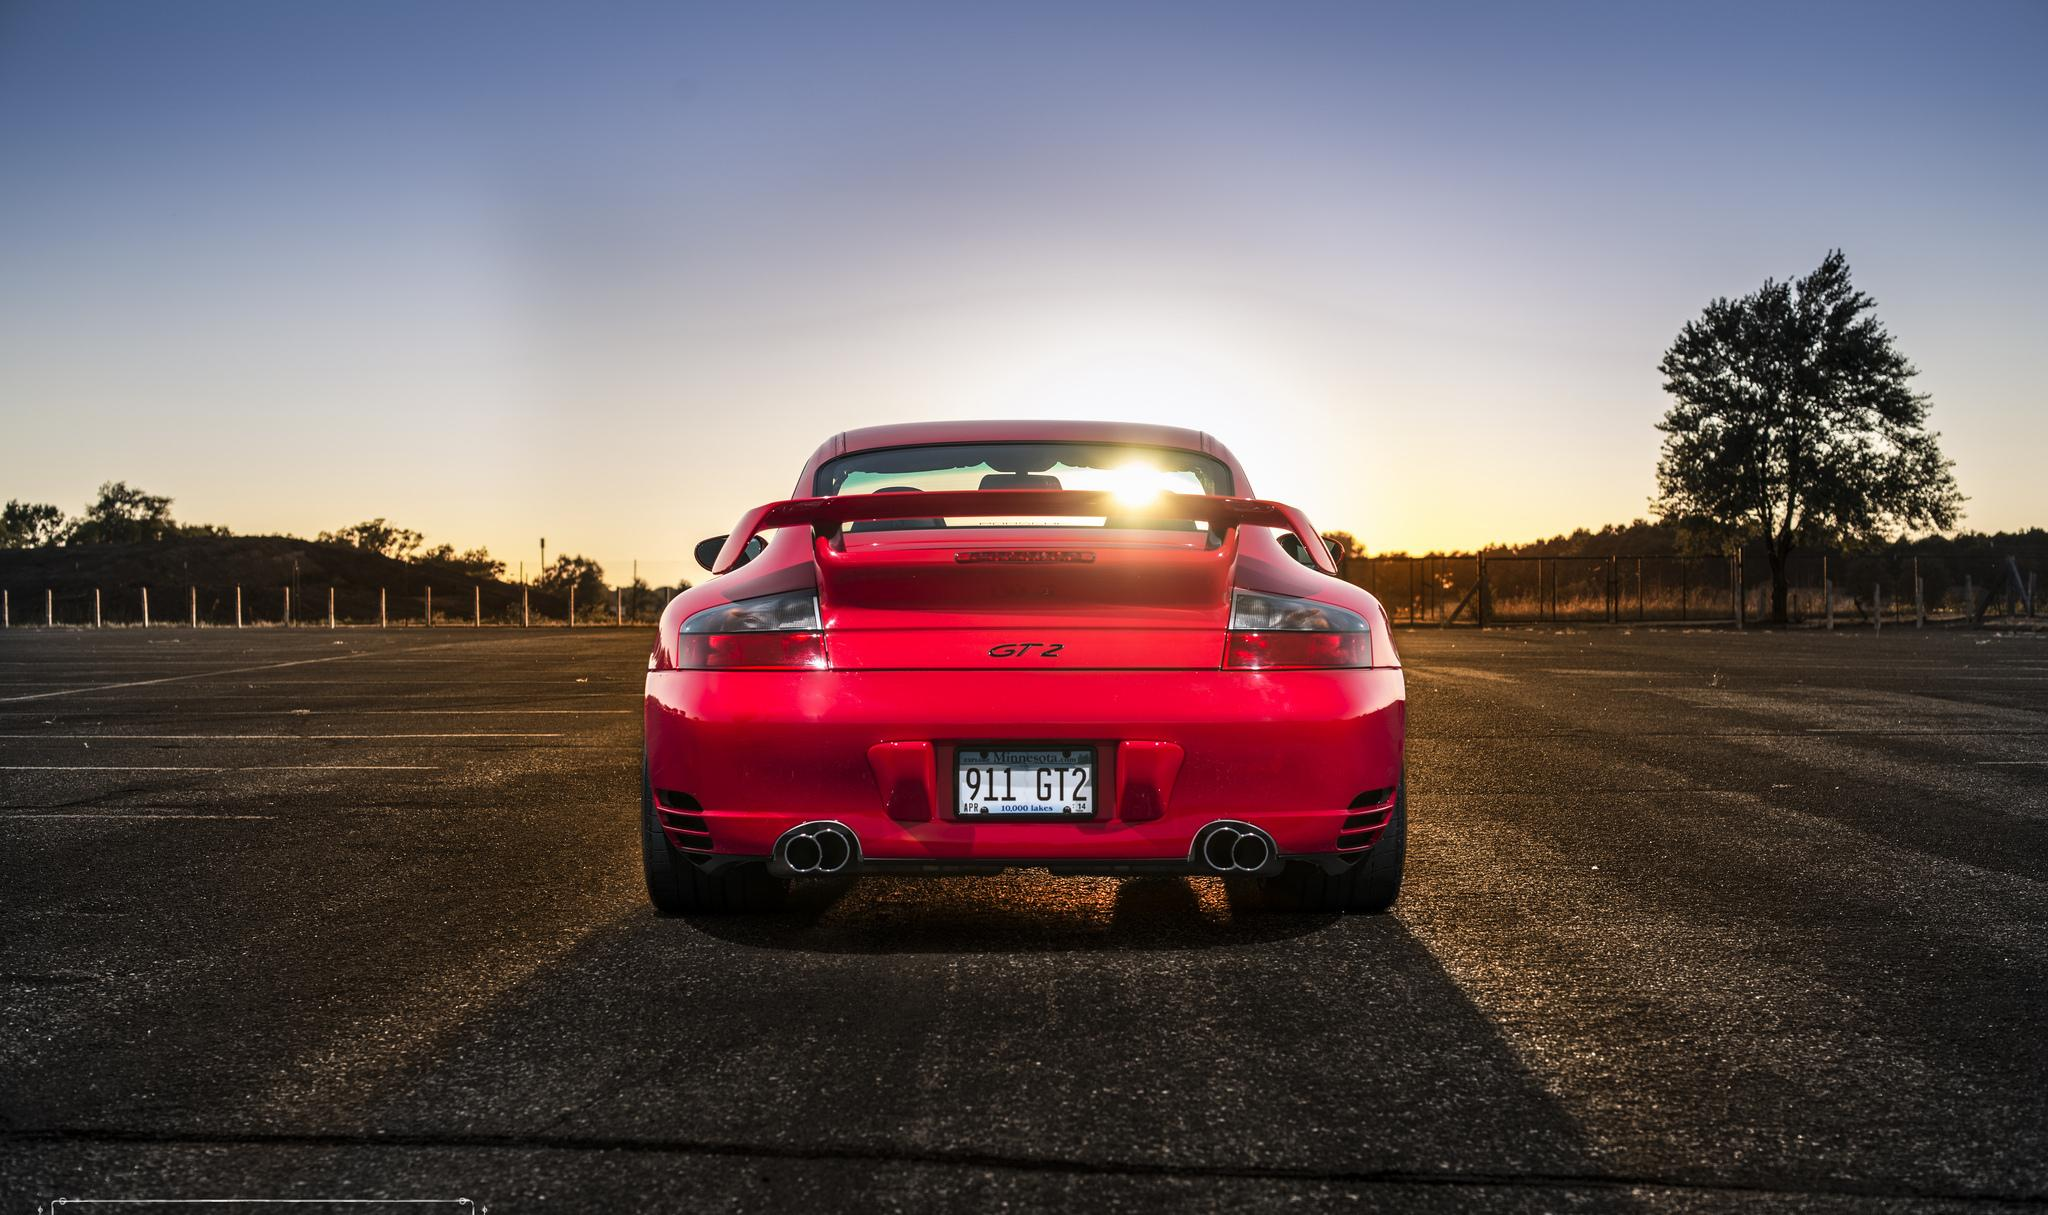 Porsche 911 Wallpapers HD Download 2048x1215